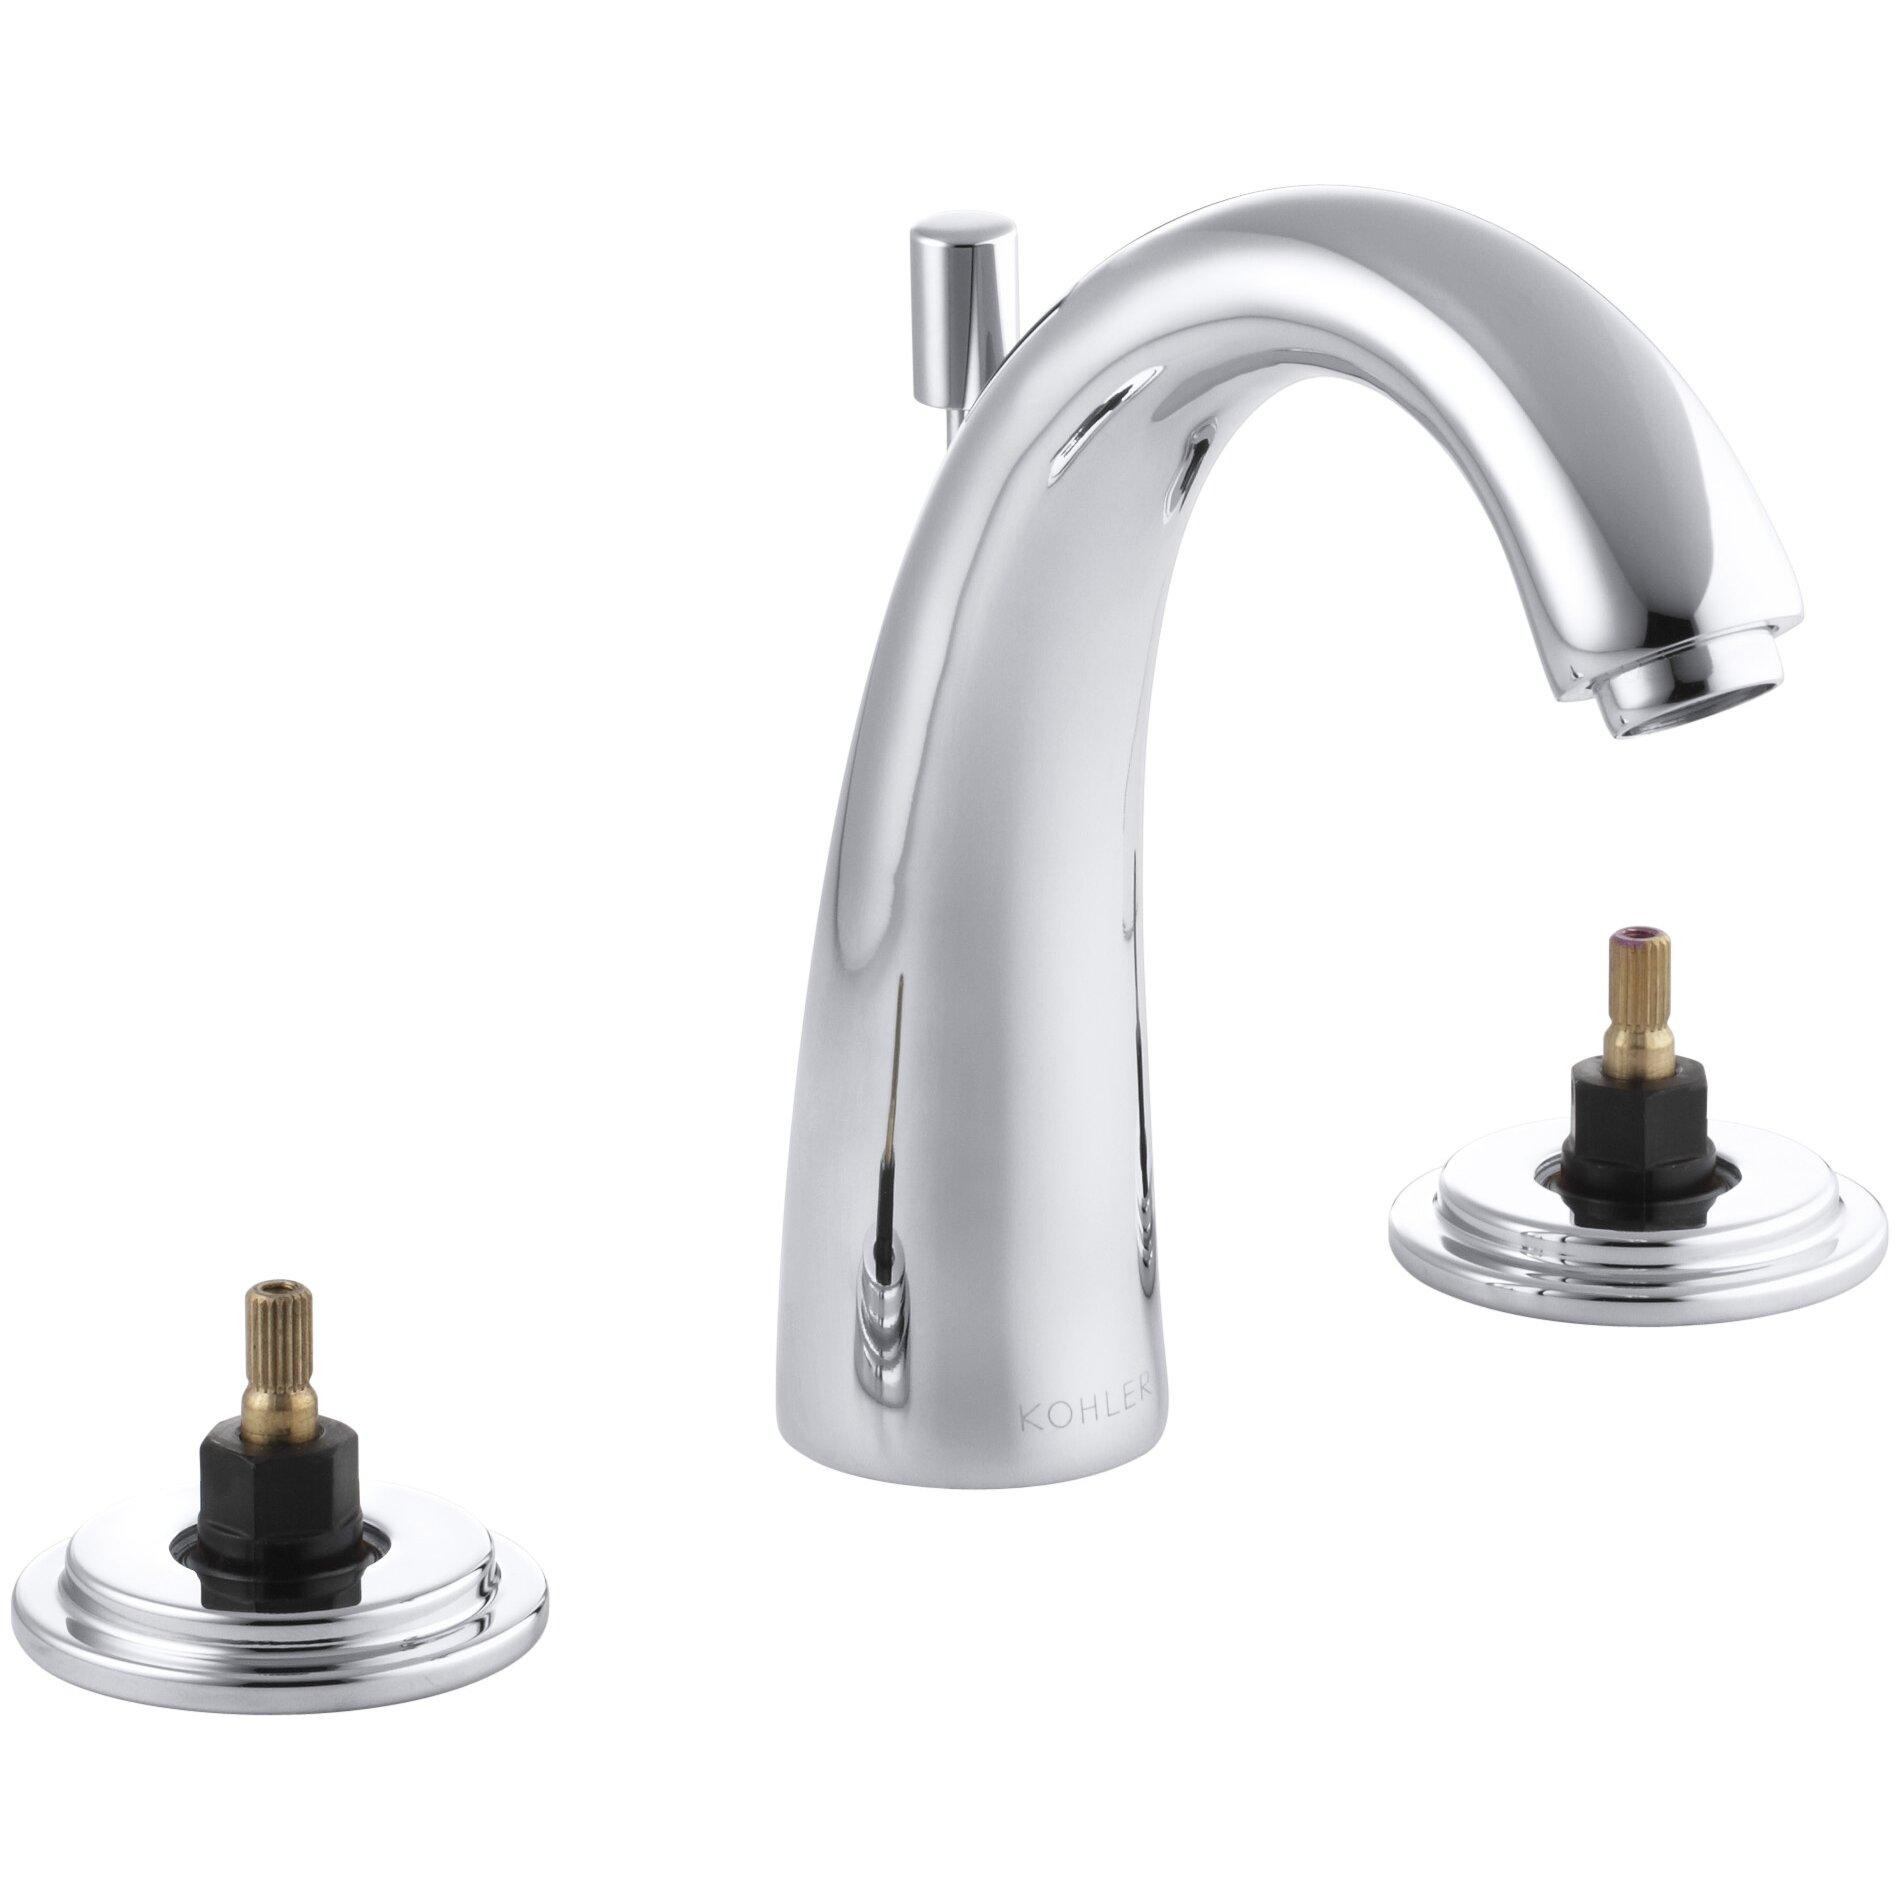 Kohler Taboret Widespread Bathroom Sink Faucet With High